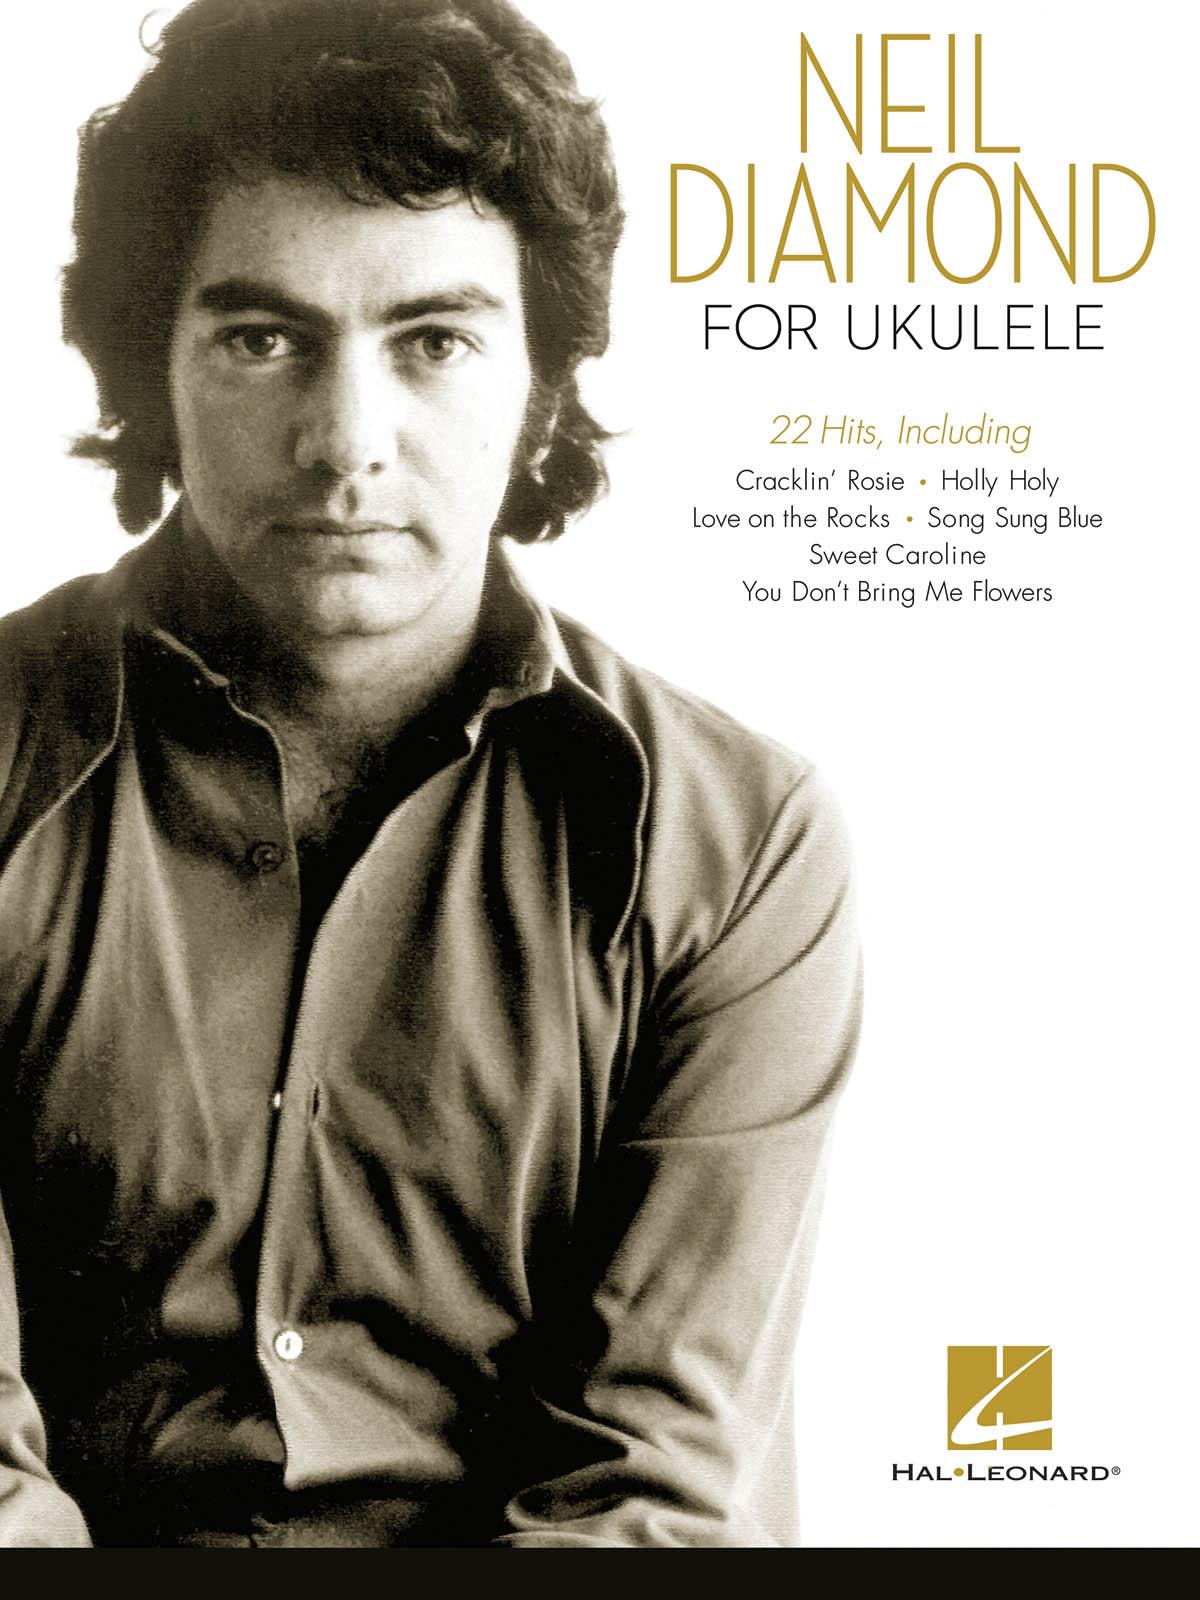 Neil Diamond: Neil Diamond For Ukulele: Ukulele Solo: Artist Songbook